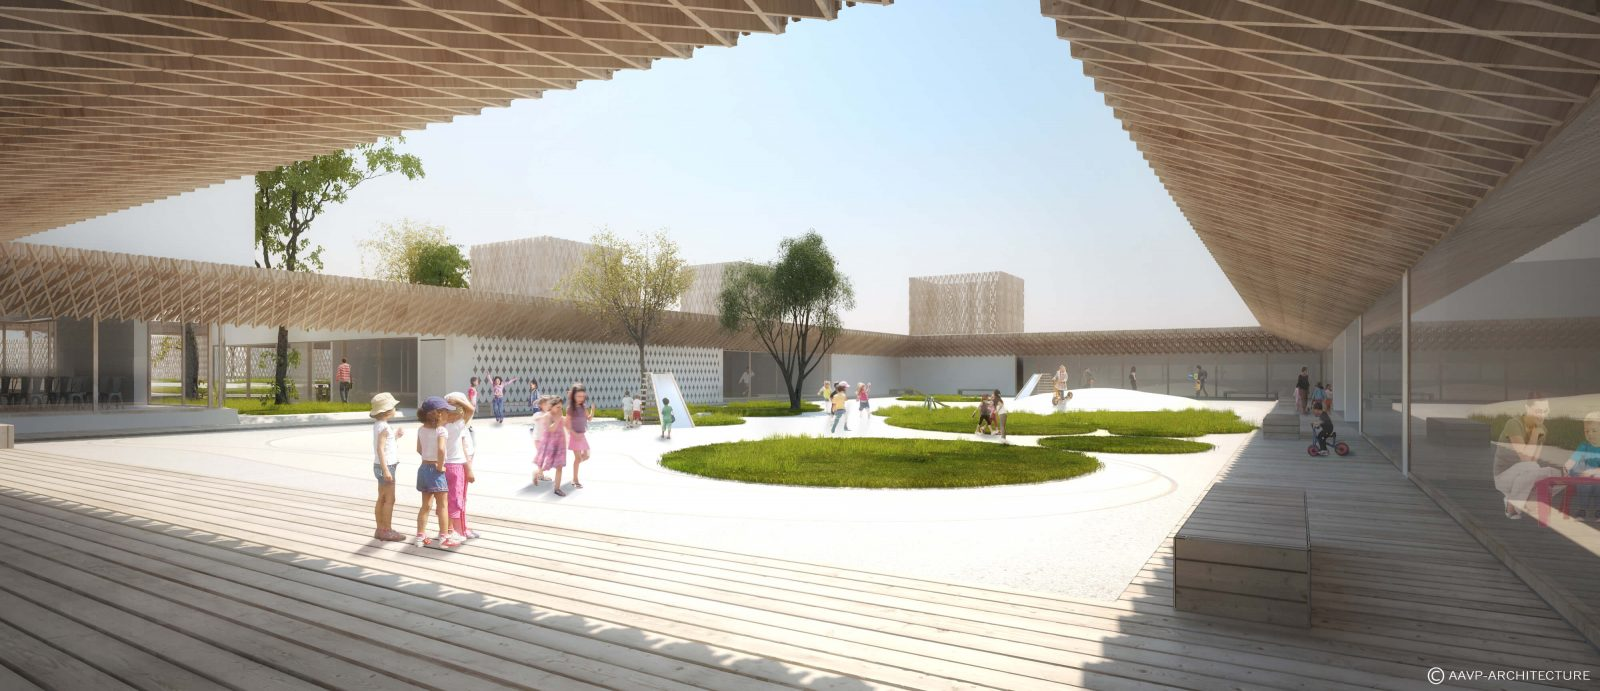 Perspective du projet (Vincent Parreira, cabinet AAVP)